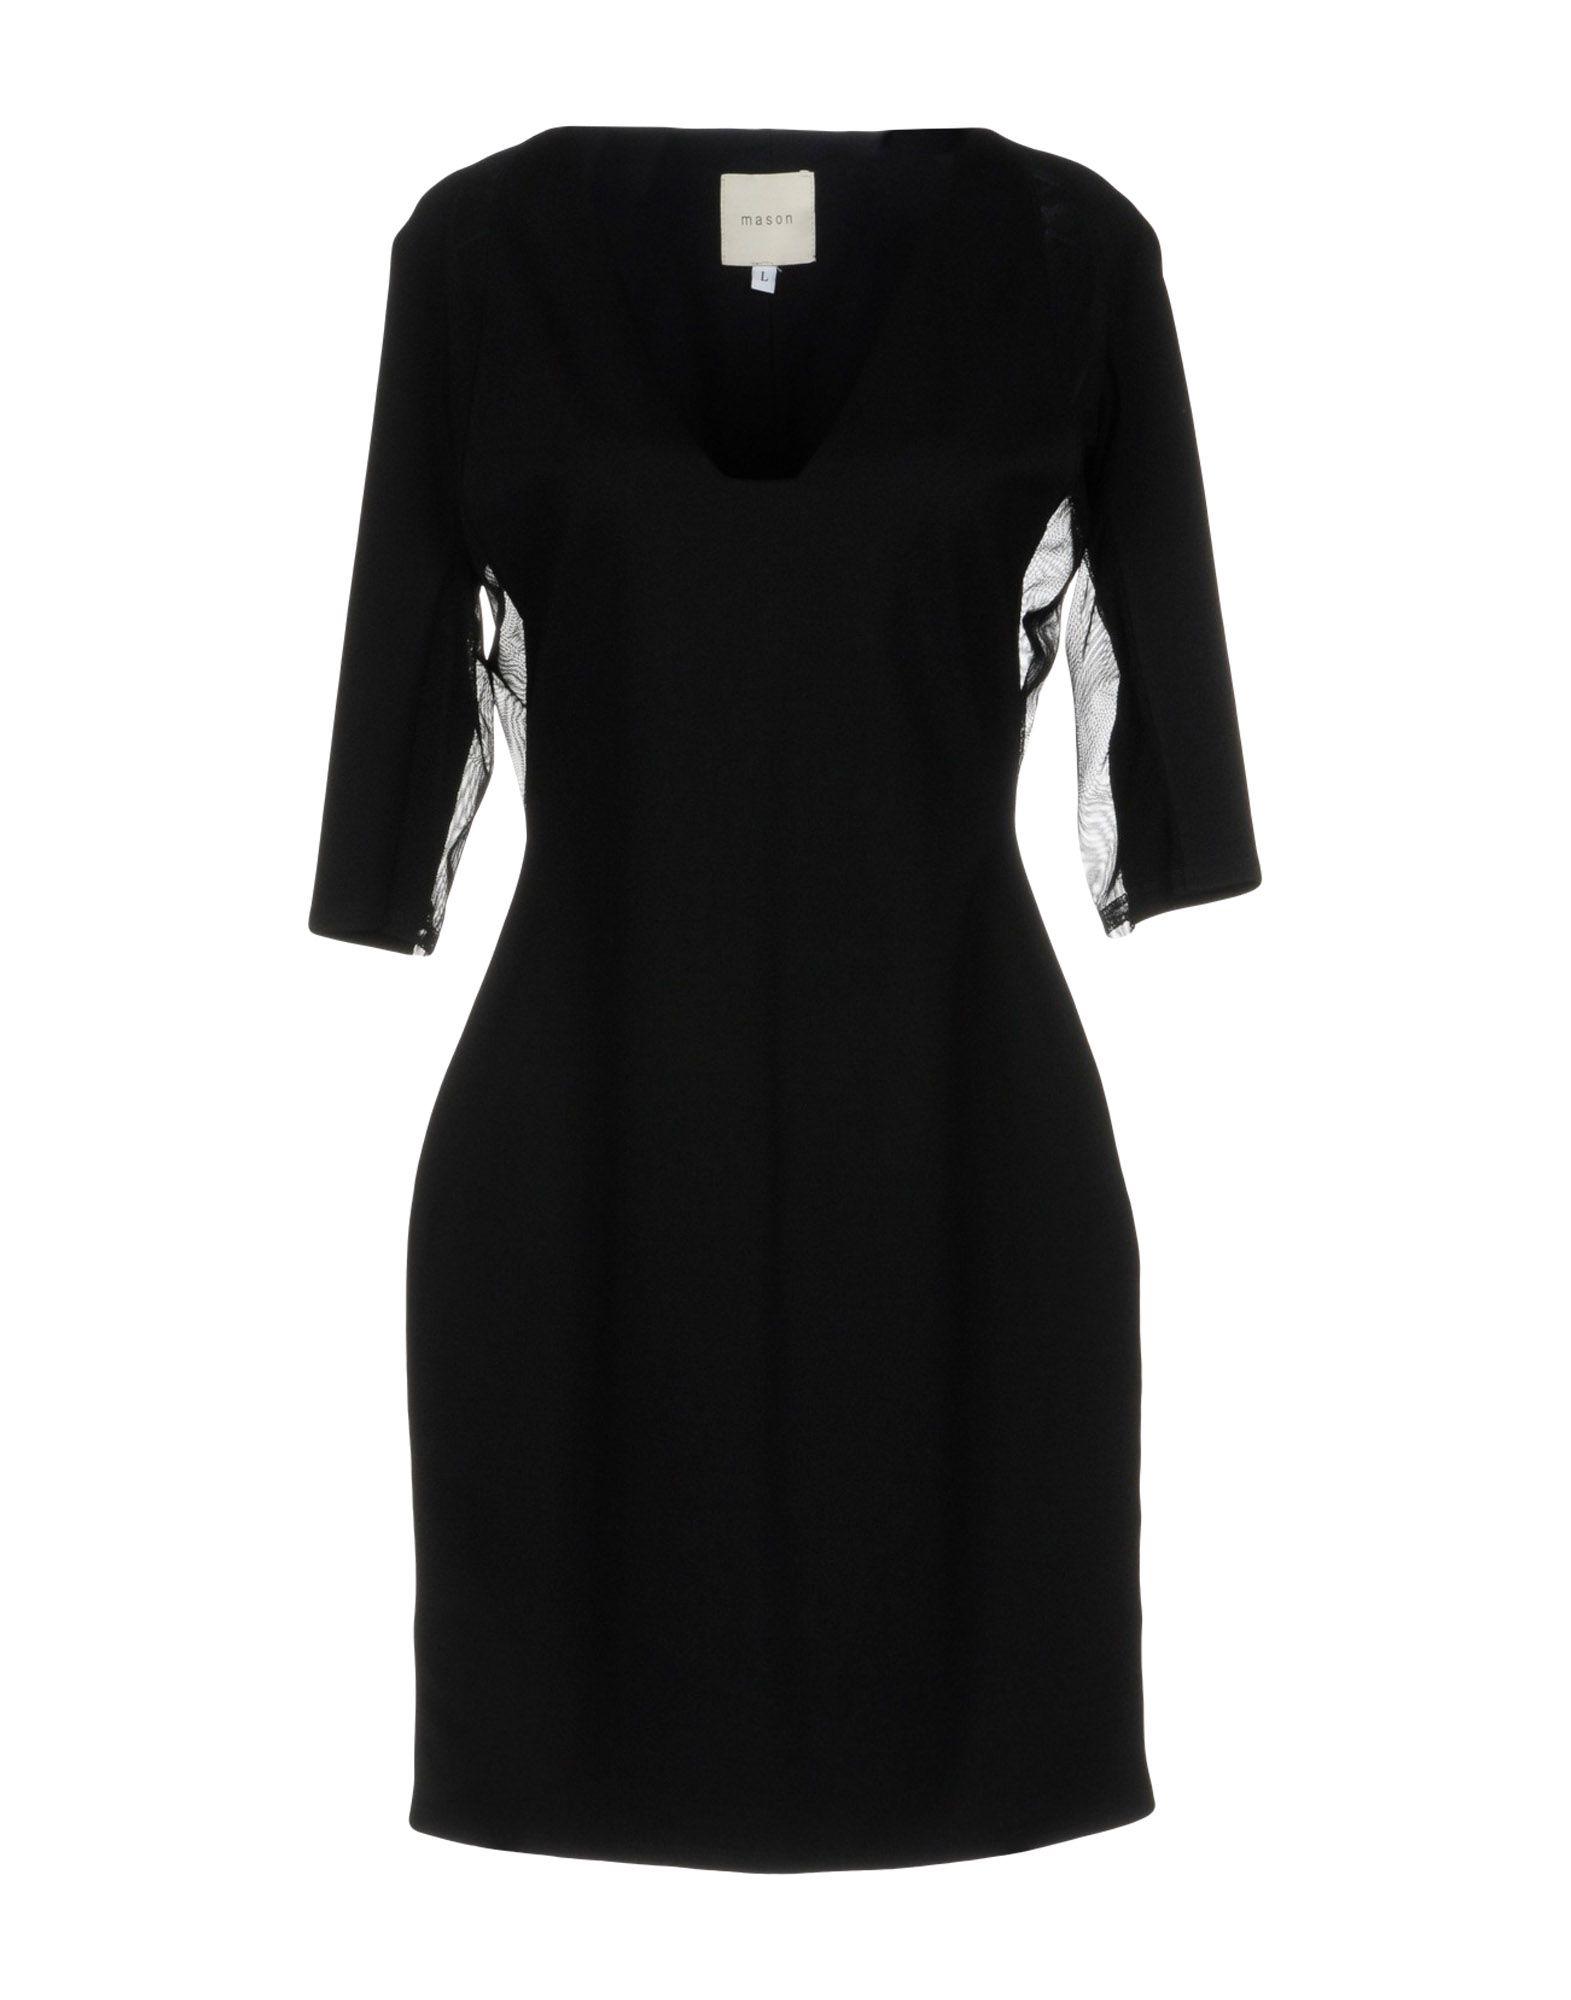 MASON Short Dress in Black